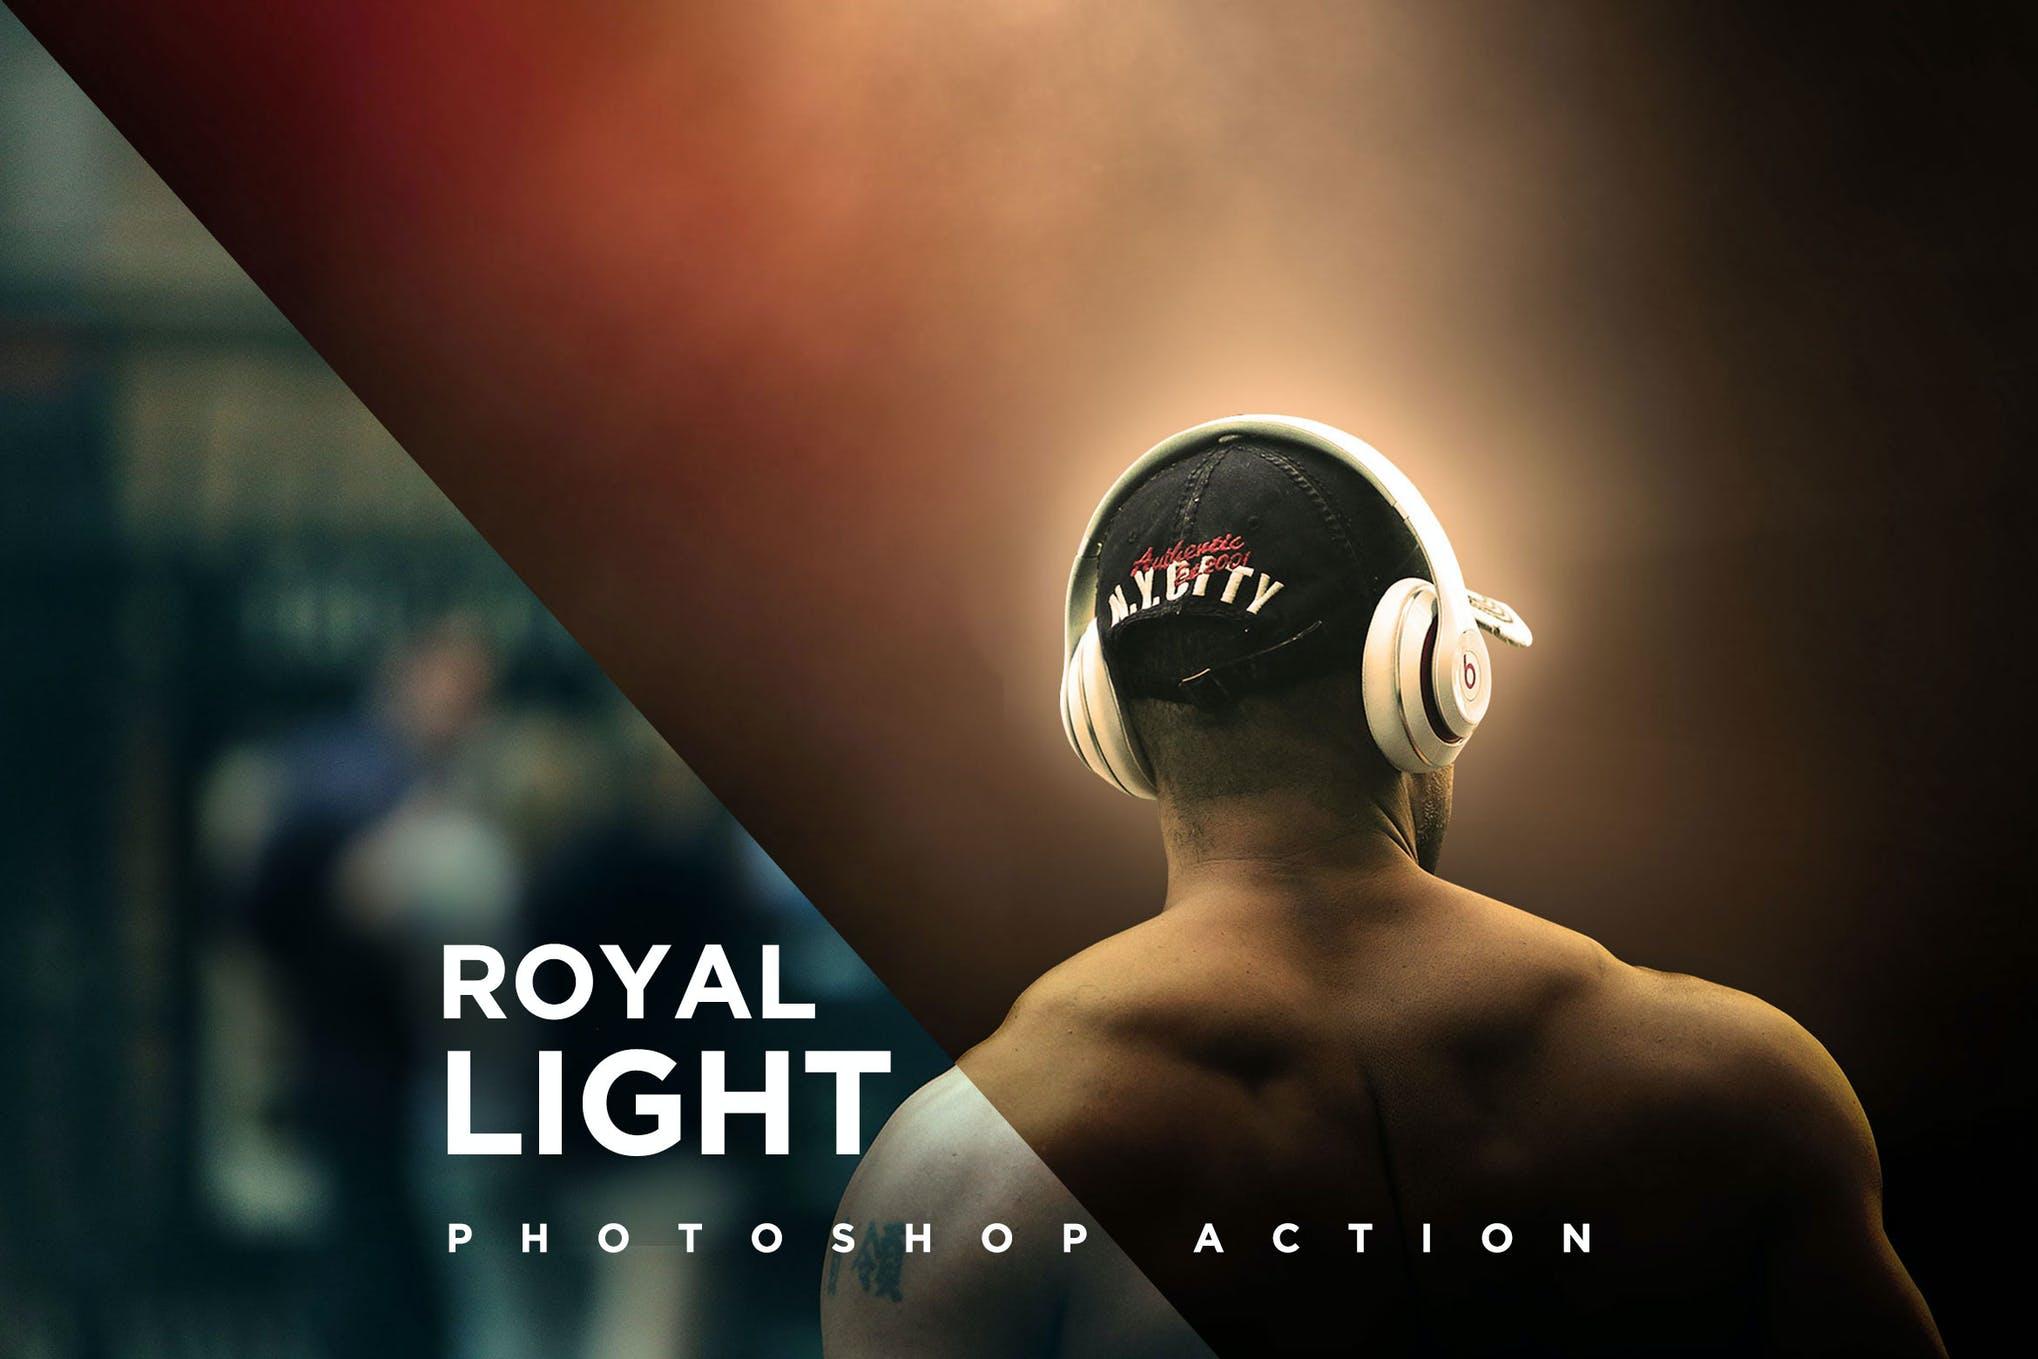 Spotlight Photoshop